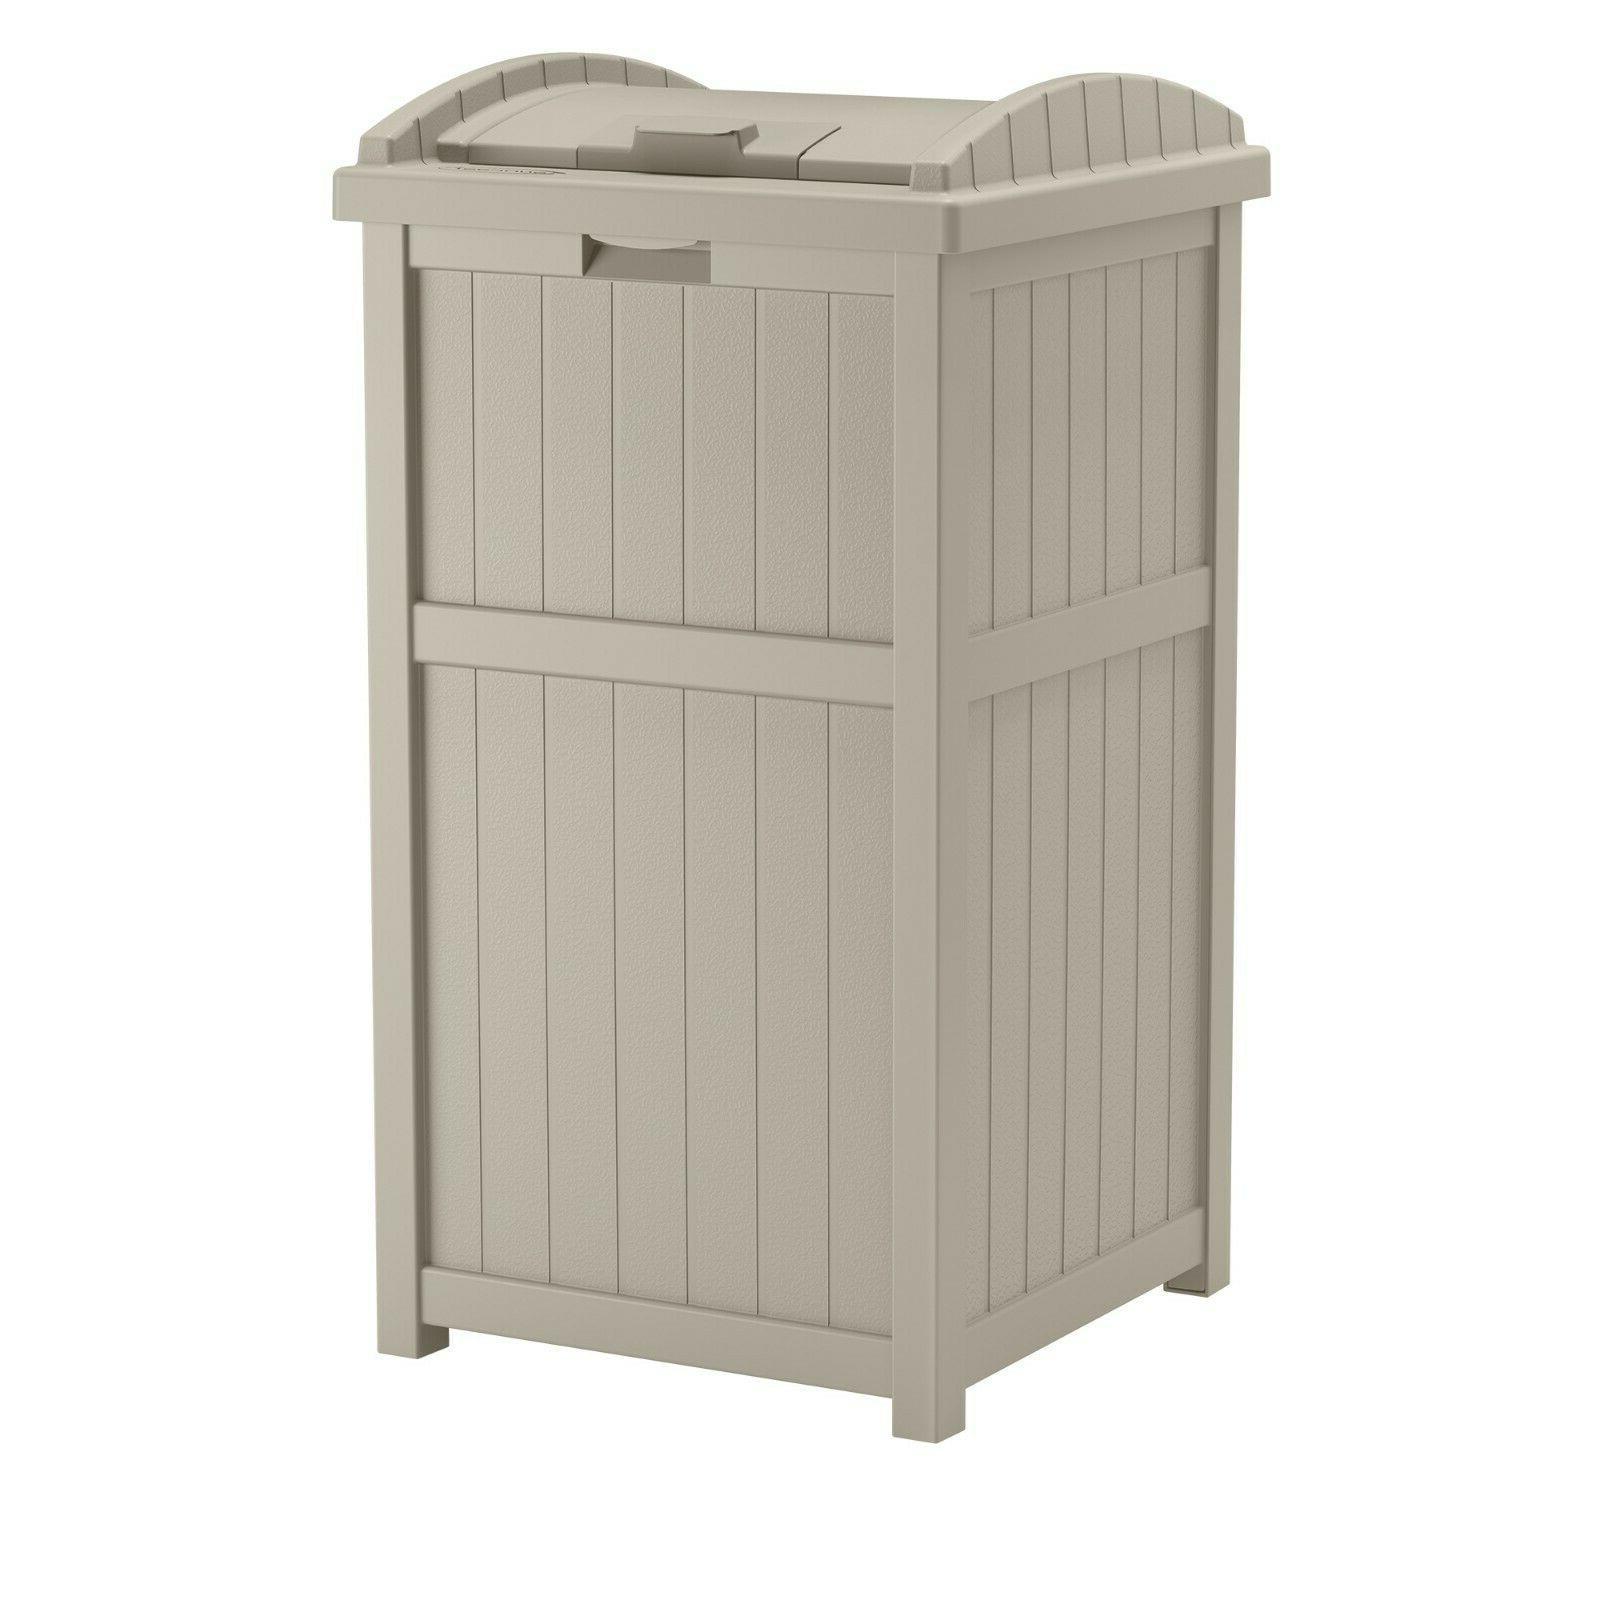 Light 33 Gallon Trash Waste Bin Receptacle Lid